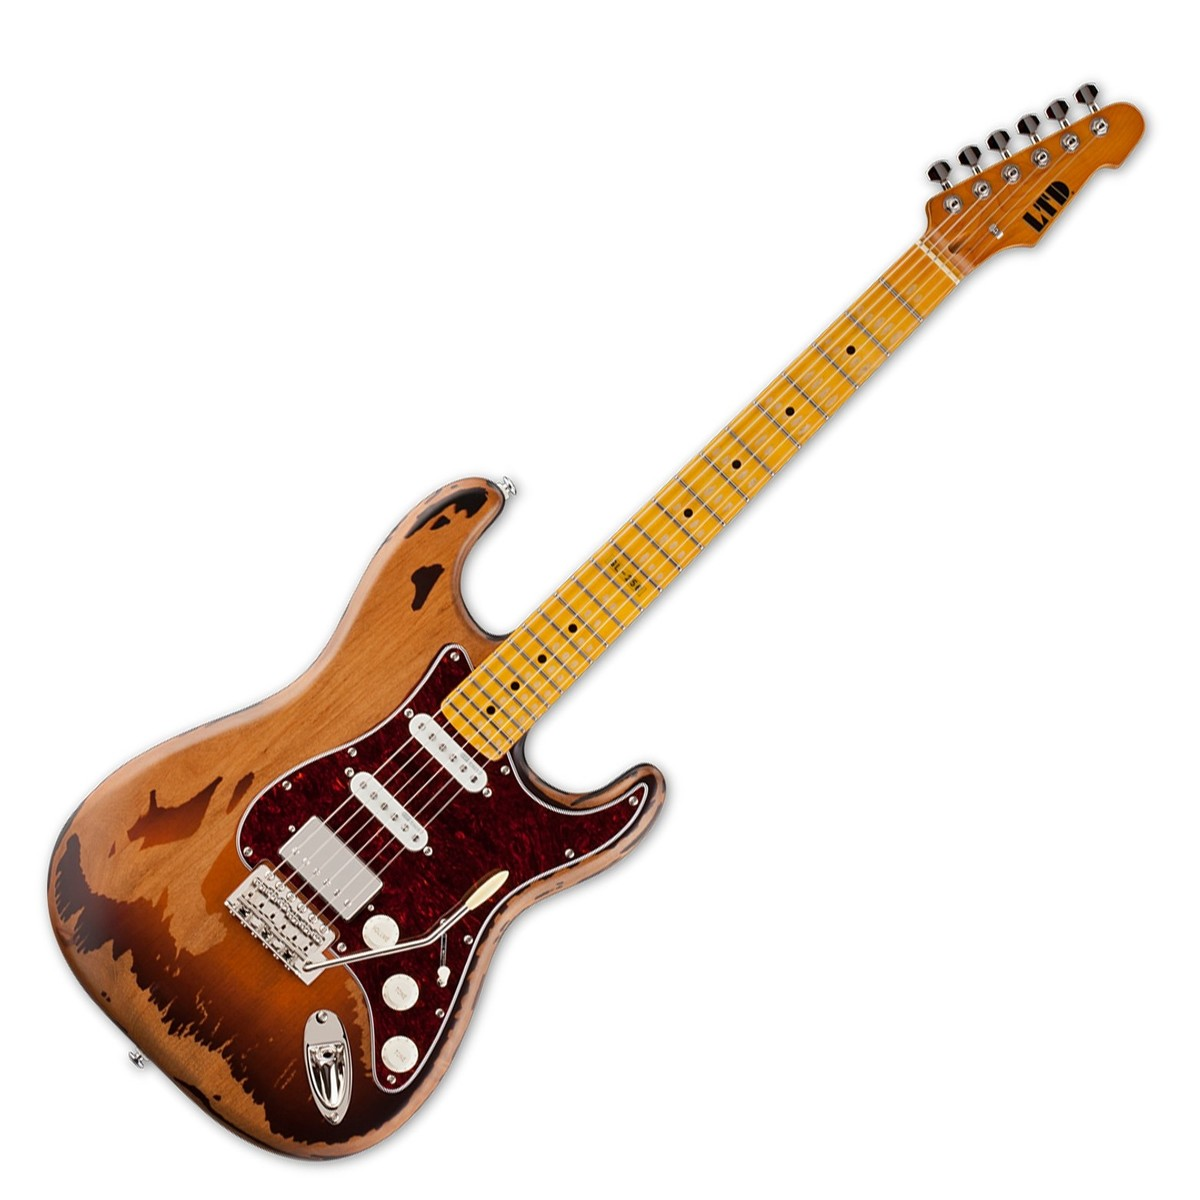 esp ltd gl 256 george lynch electric guitar distressed 2 tone at gear4music. Black Bedroom Furniture Sets. Home Design Ideas